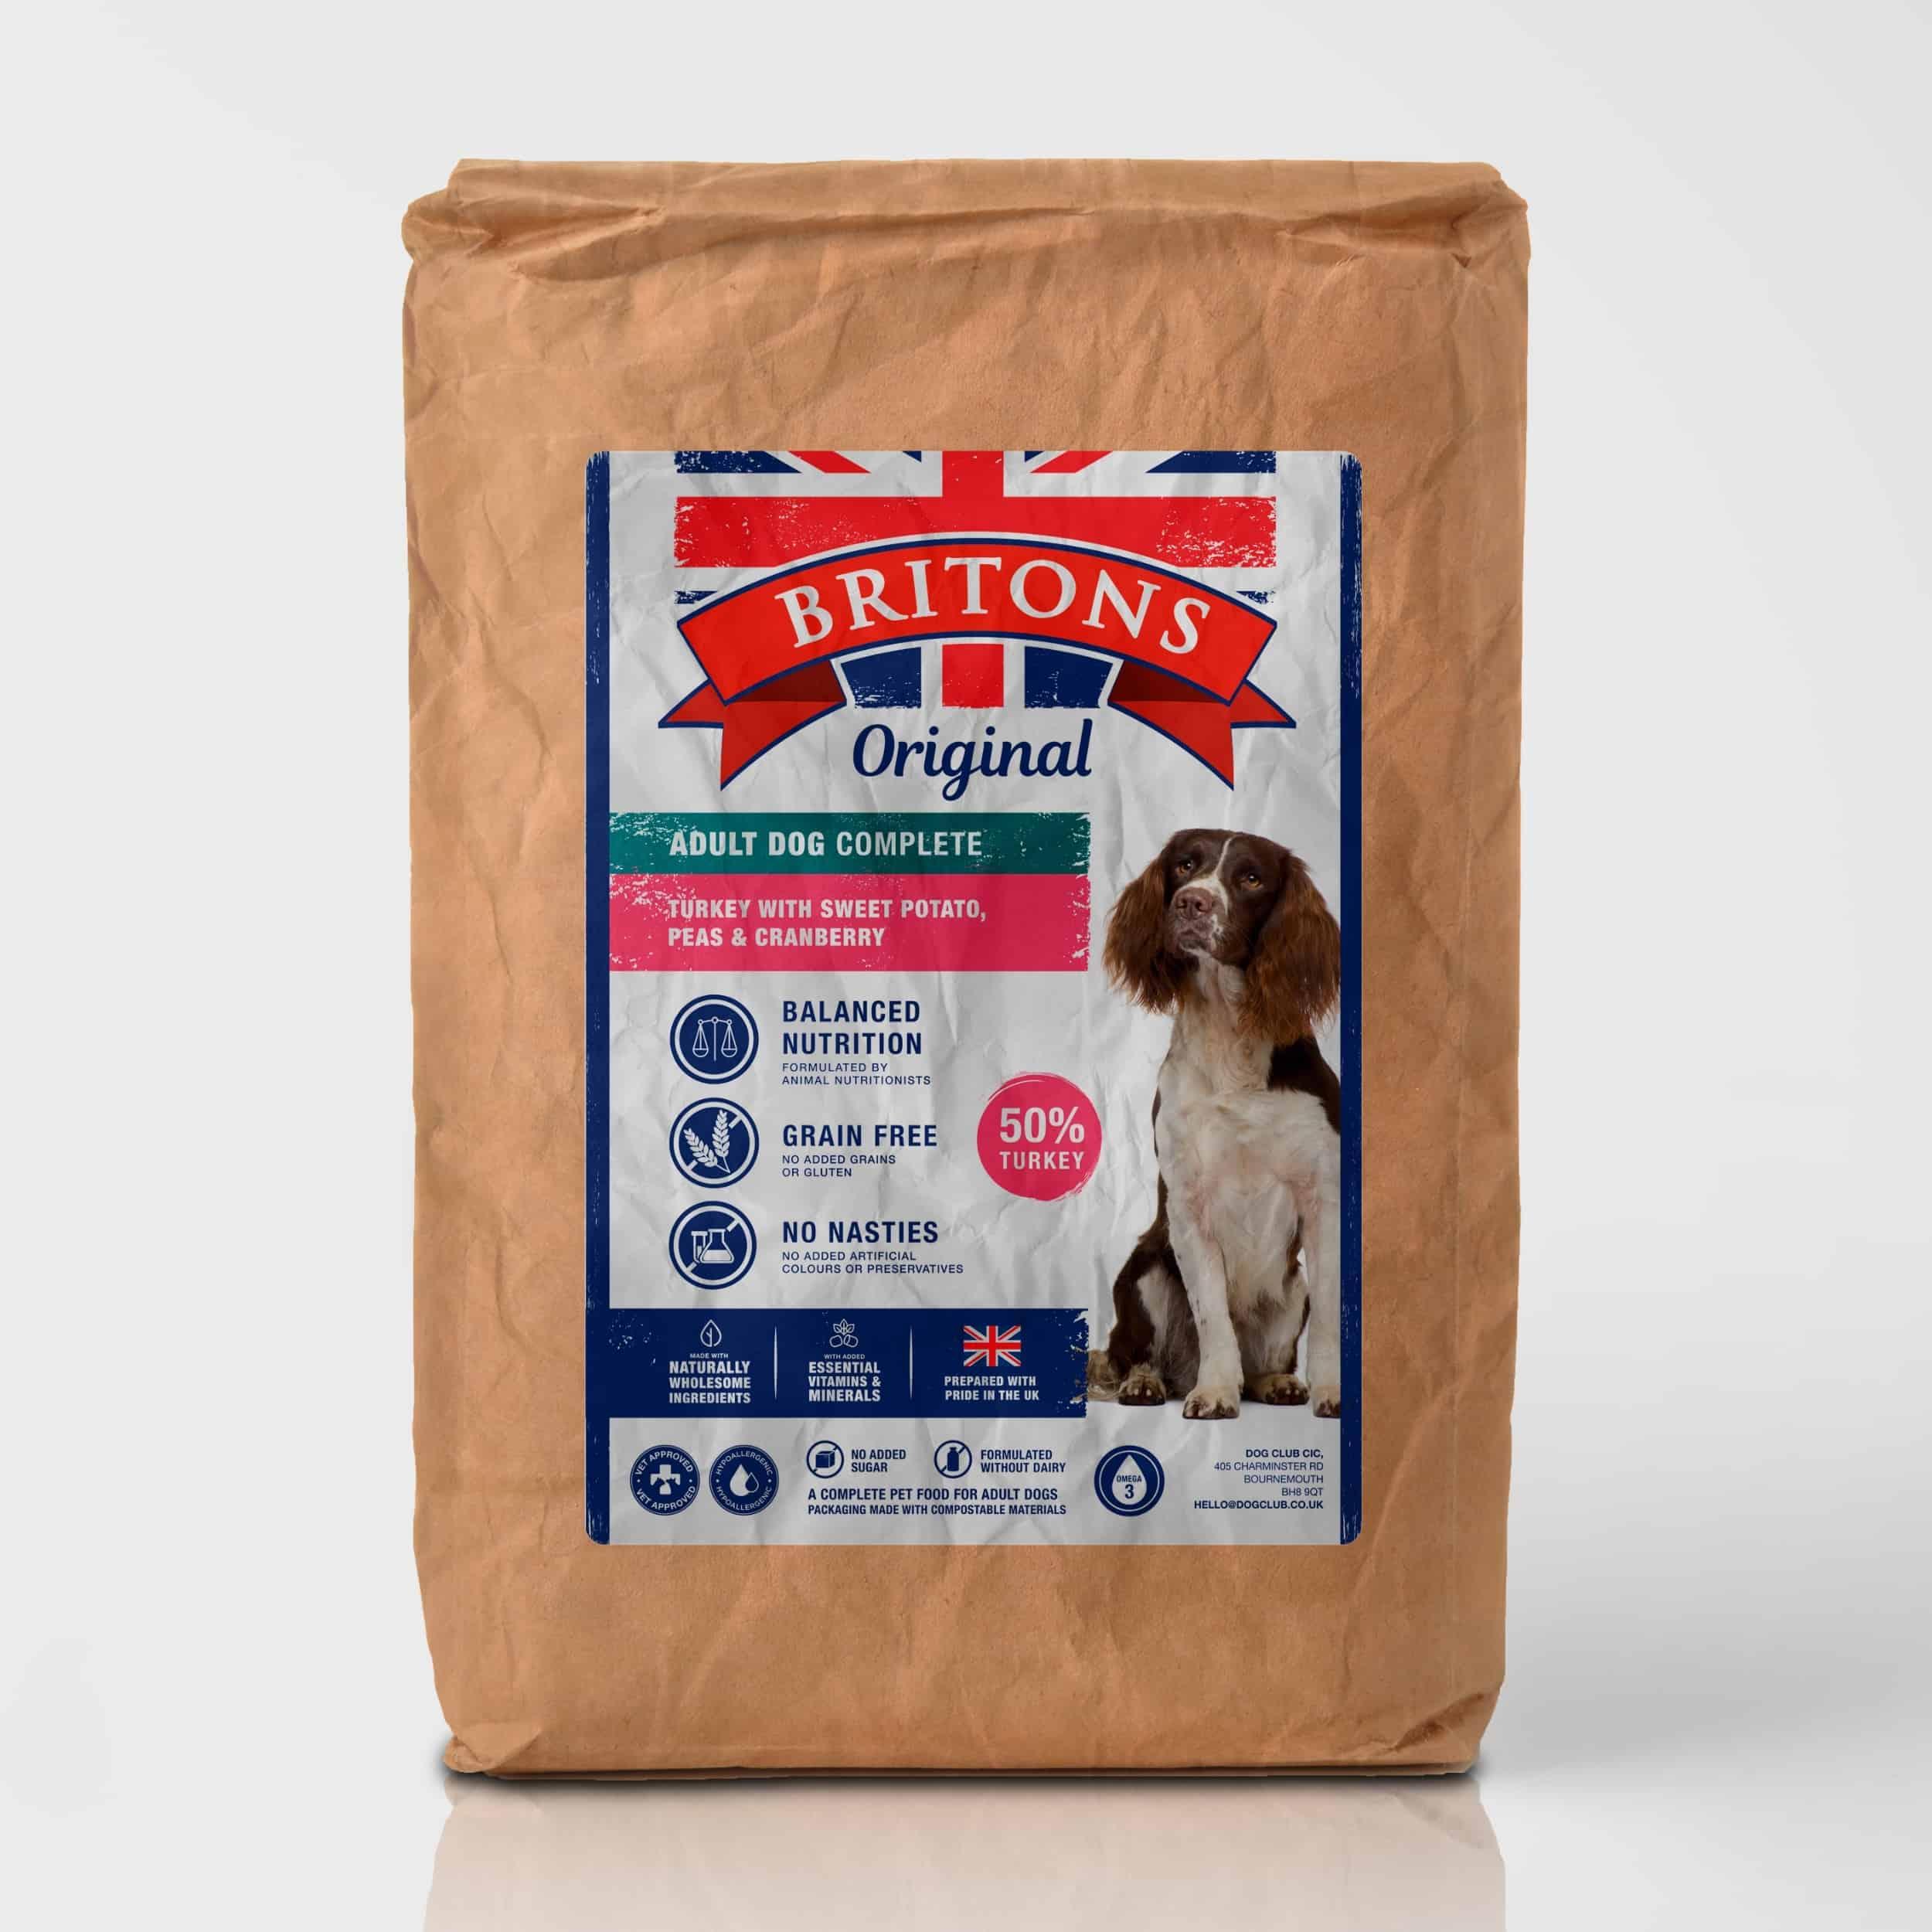 Turkey with Sweet Potato, Peas & Cranberry- Britons Original Complete Dog Food